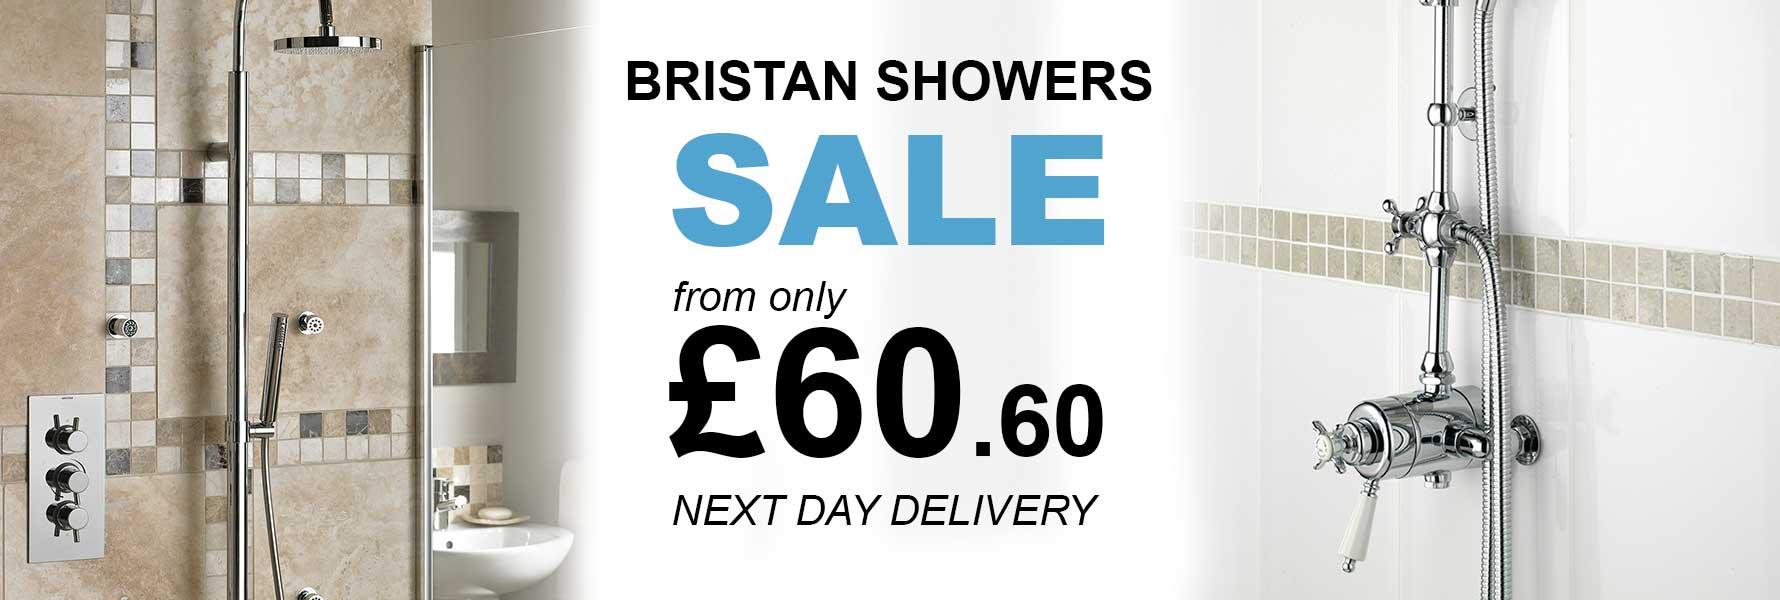 Perfect Bathroom Showers For Sale Gallery - Bathroom Design Ideas ...